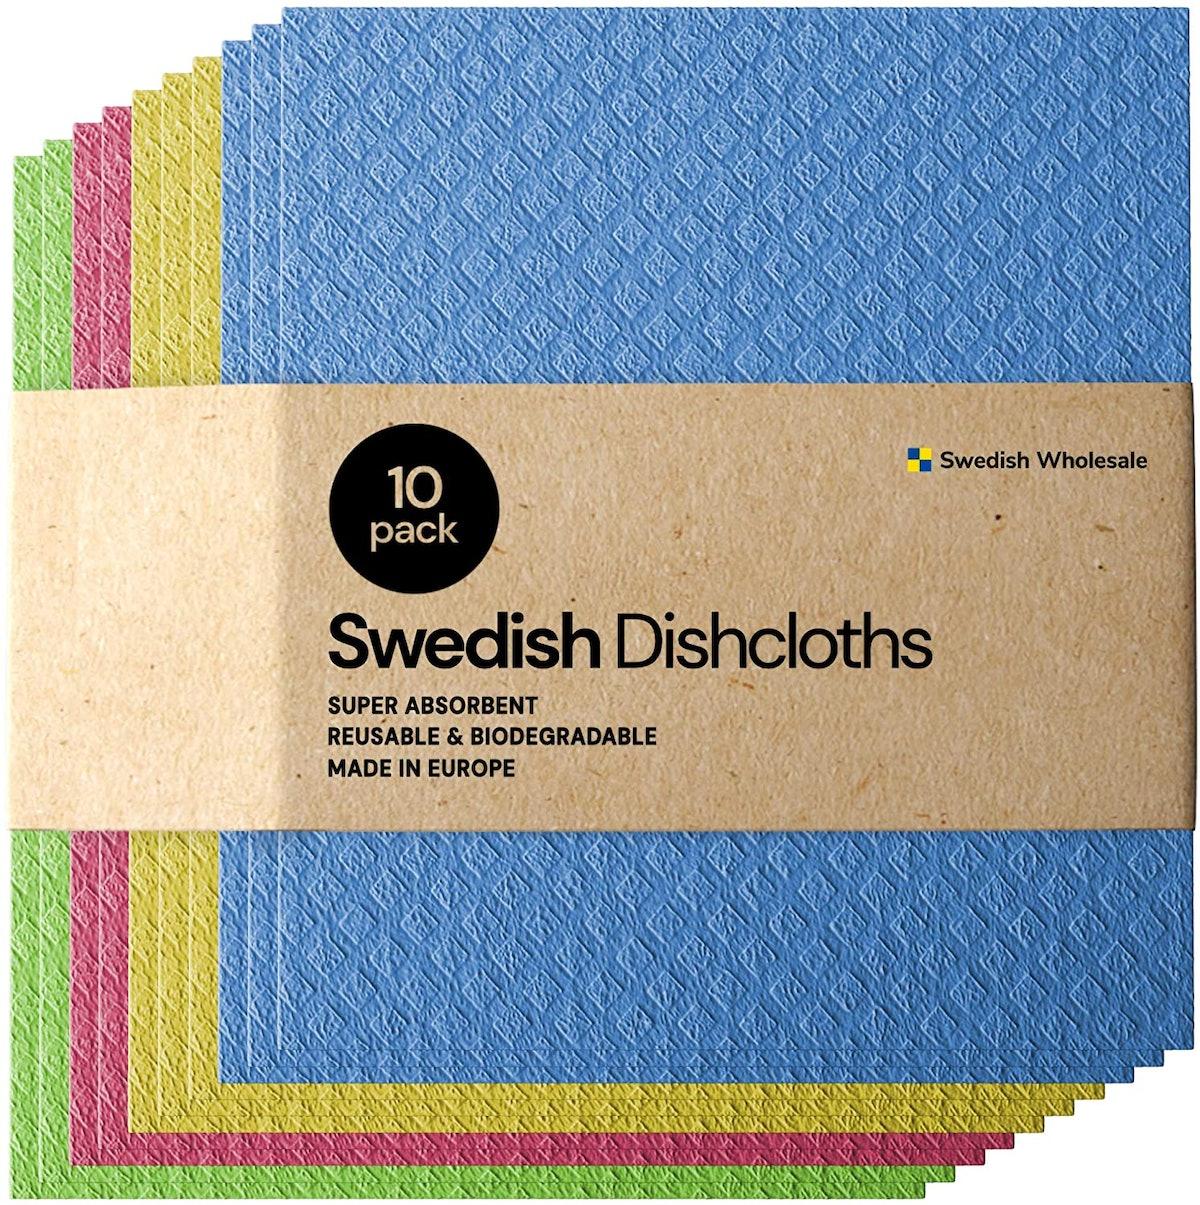 Swedish Wholesale Eco-Friendly Dishcloths (10-Pack)